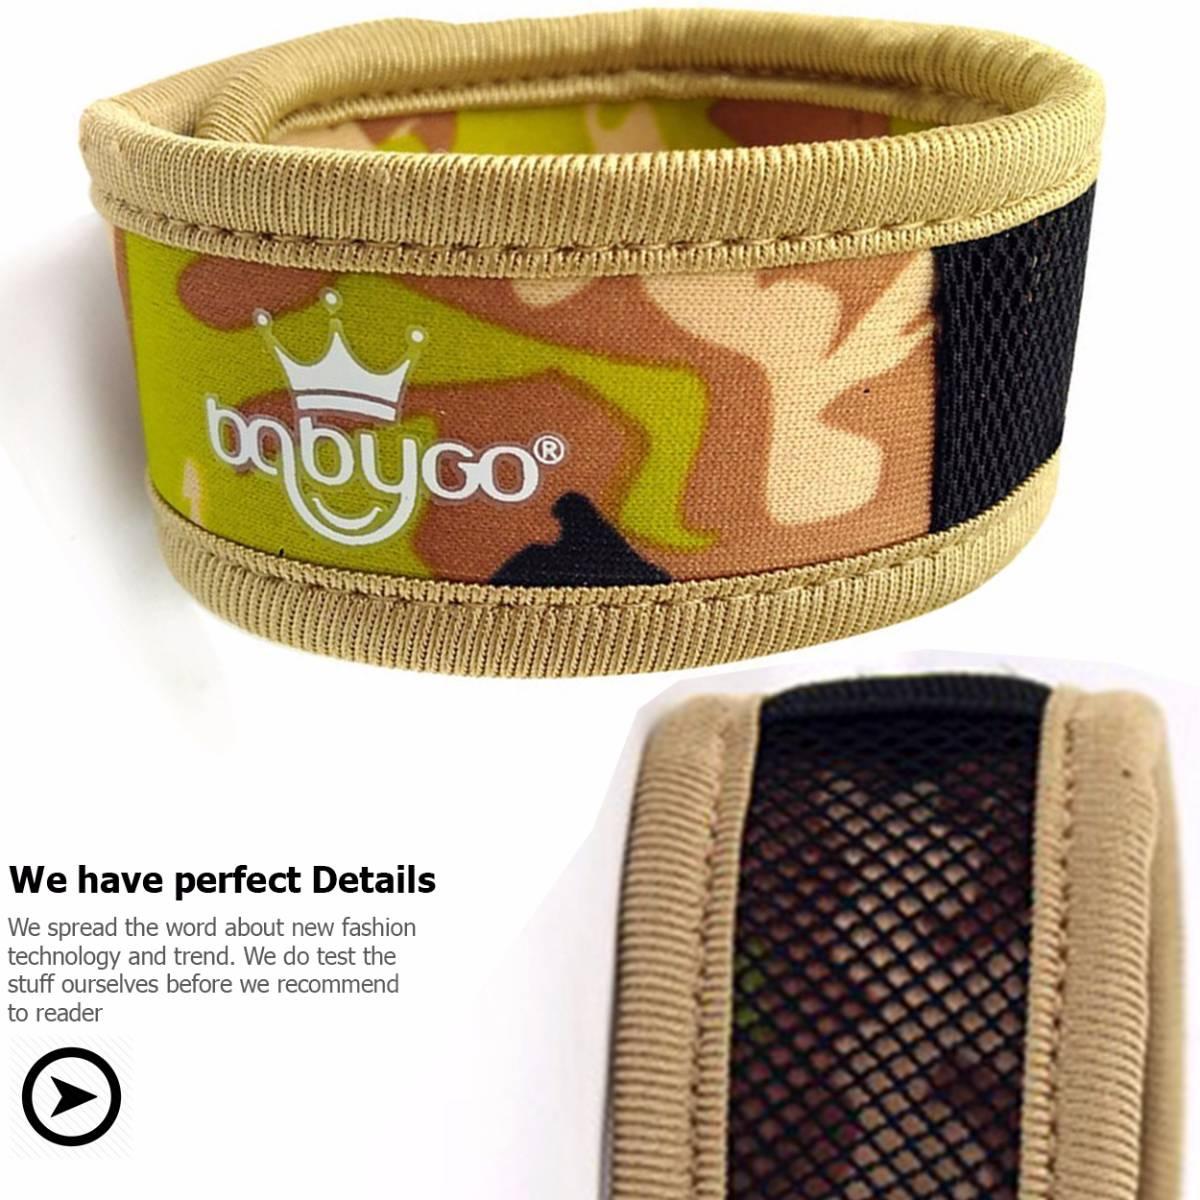 Babygo Neoprene Mosquito Repellent Wristband Camouflage (gelang Anti Nyamuk)1